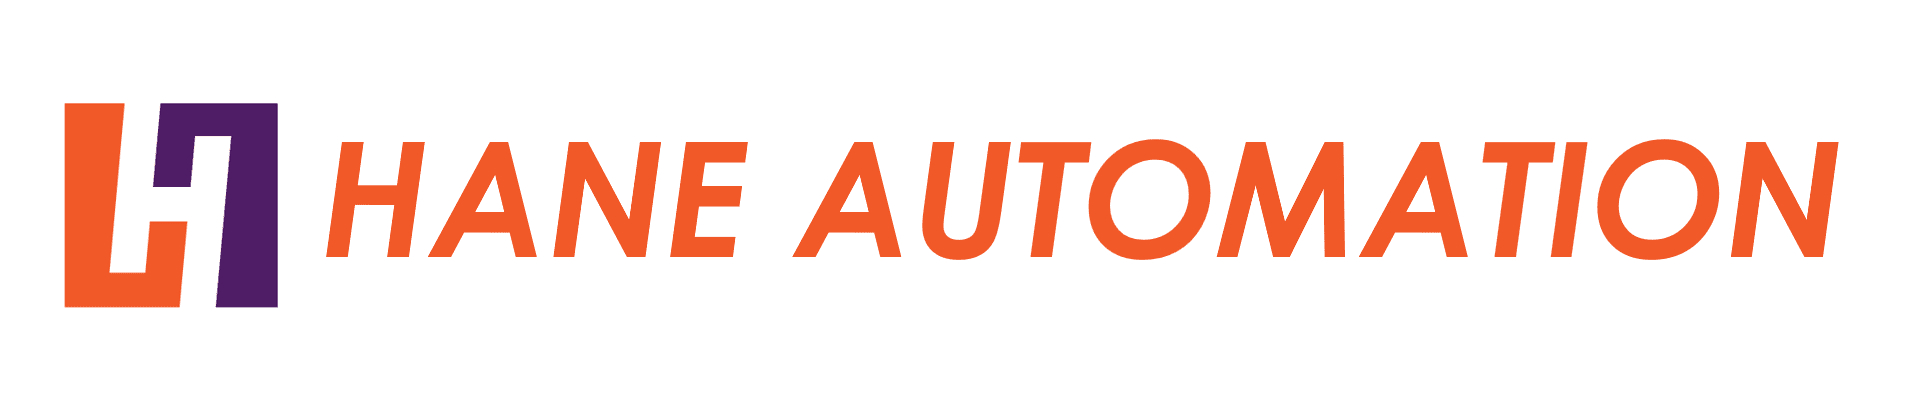 Hane Automation